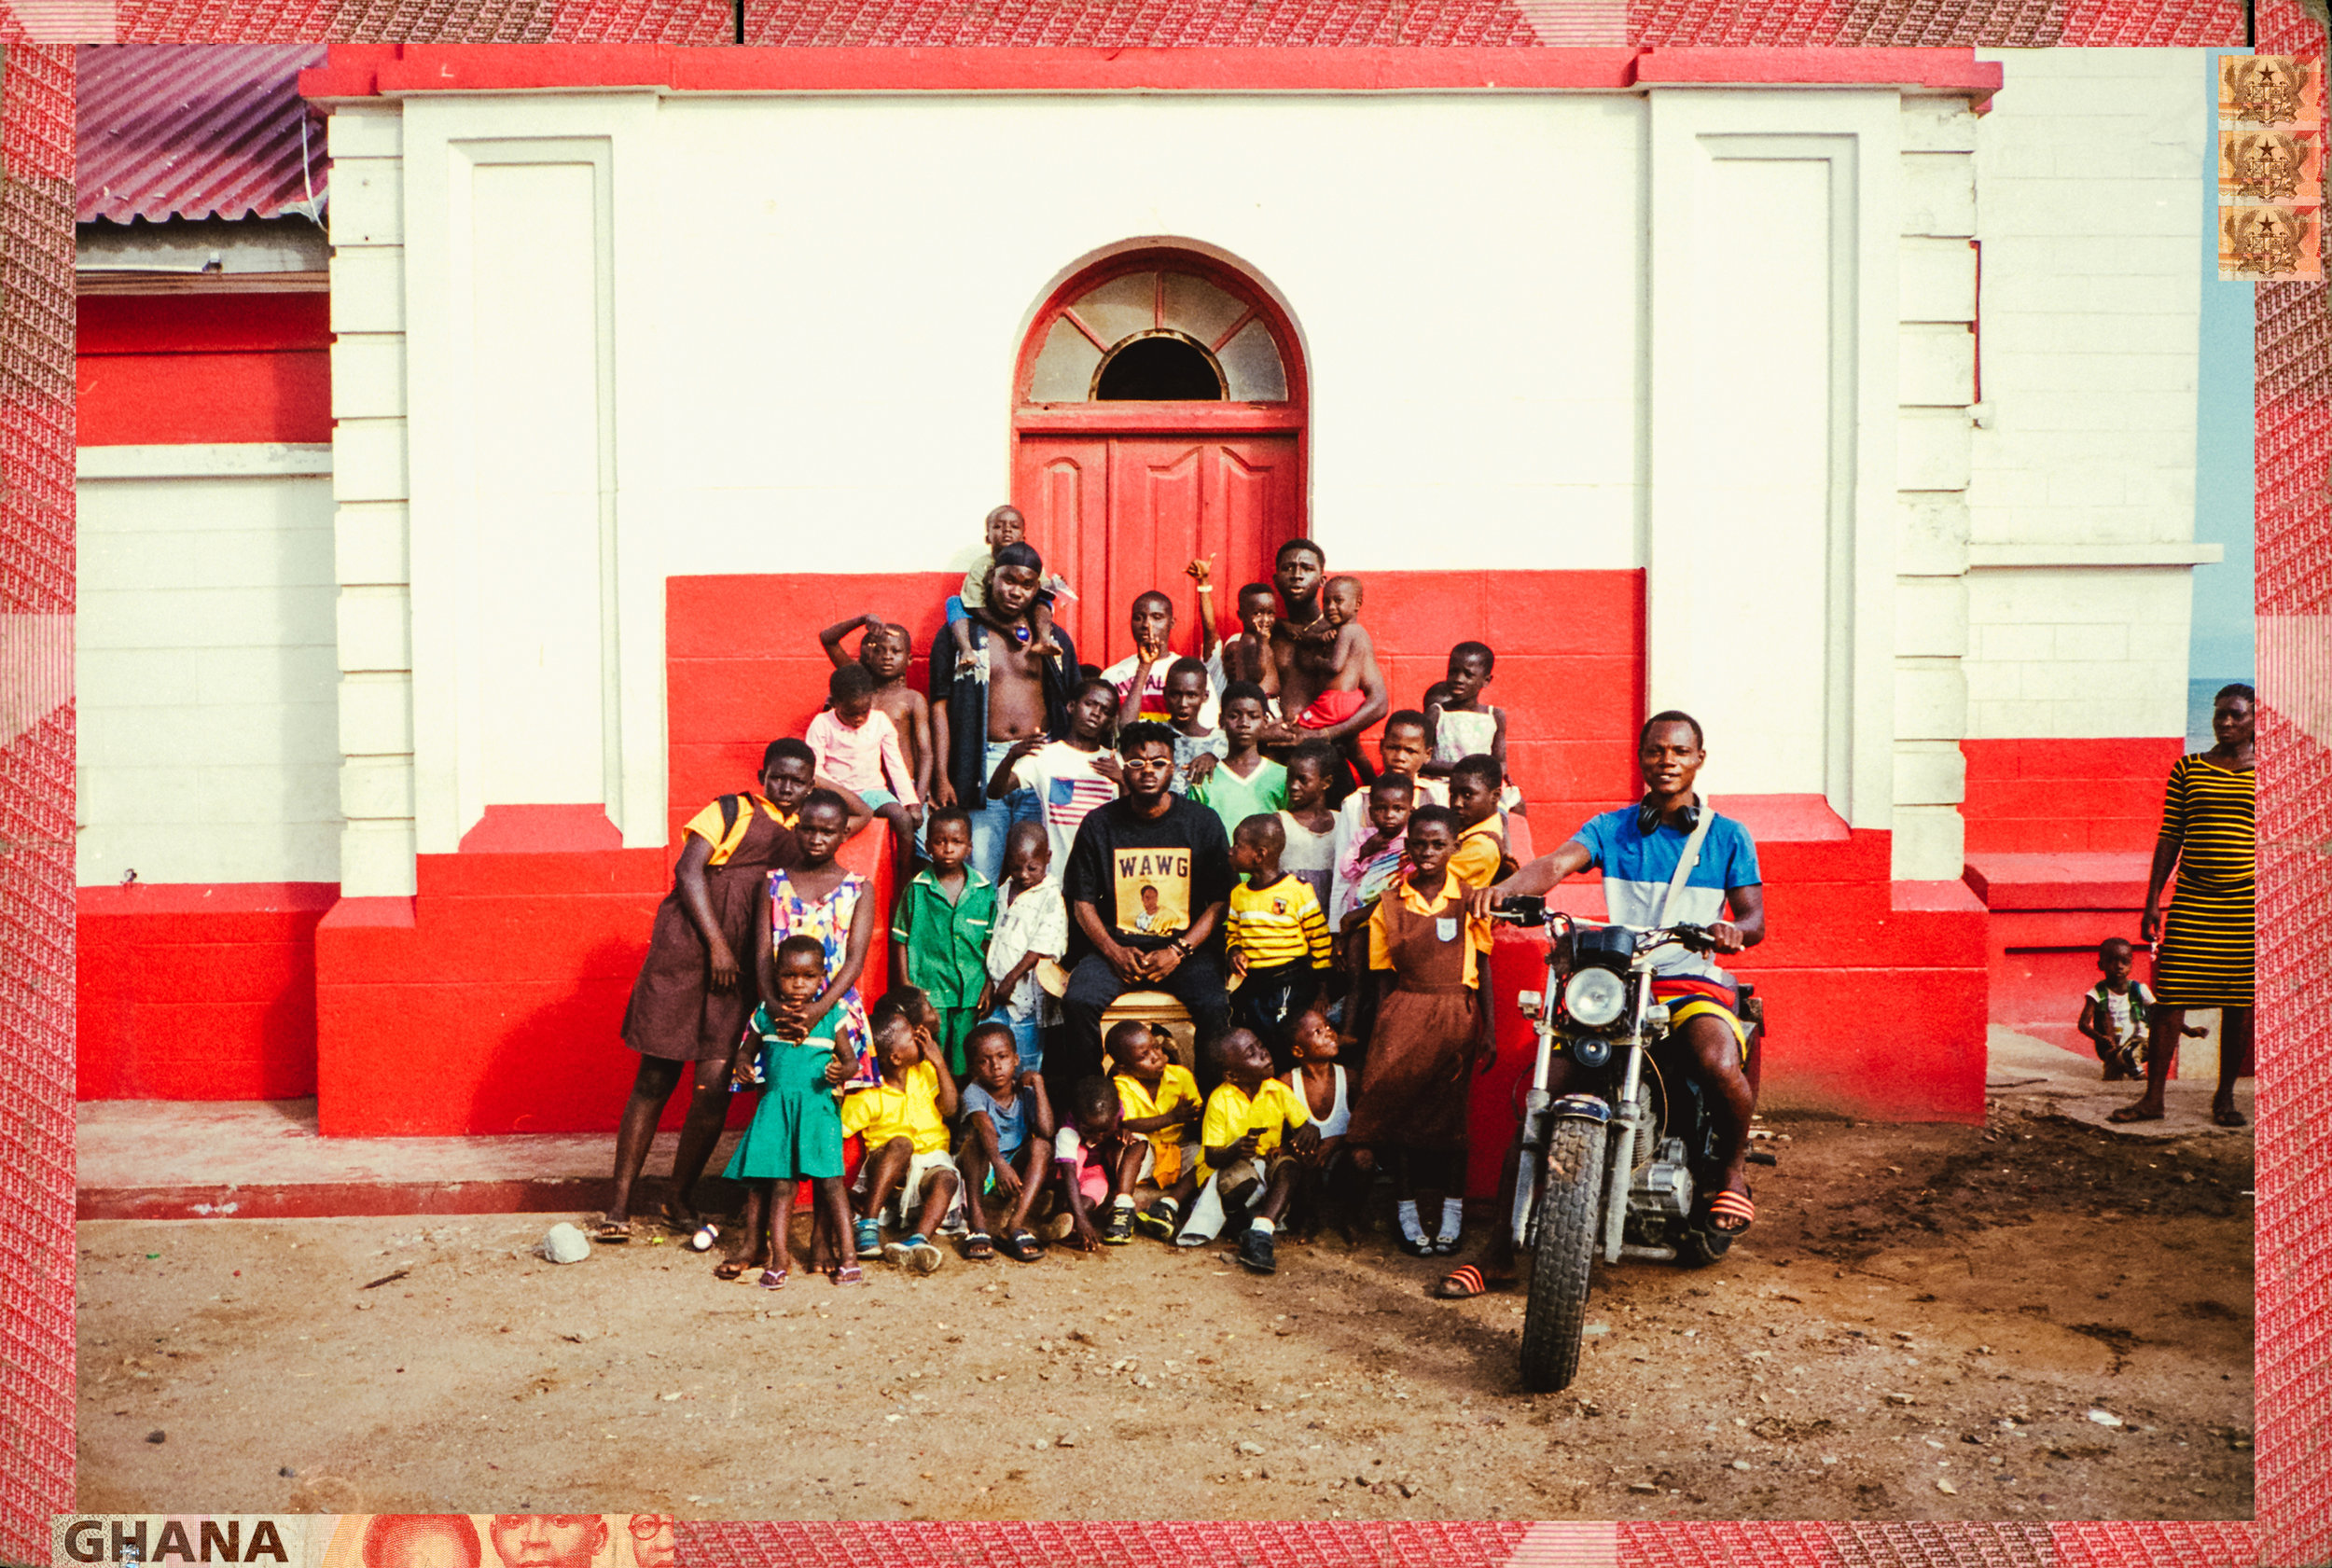 Ghana_Lookbook (288)-2_V2.jpg